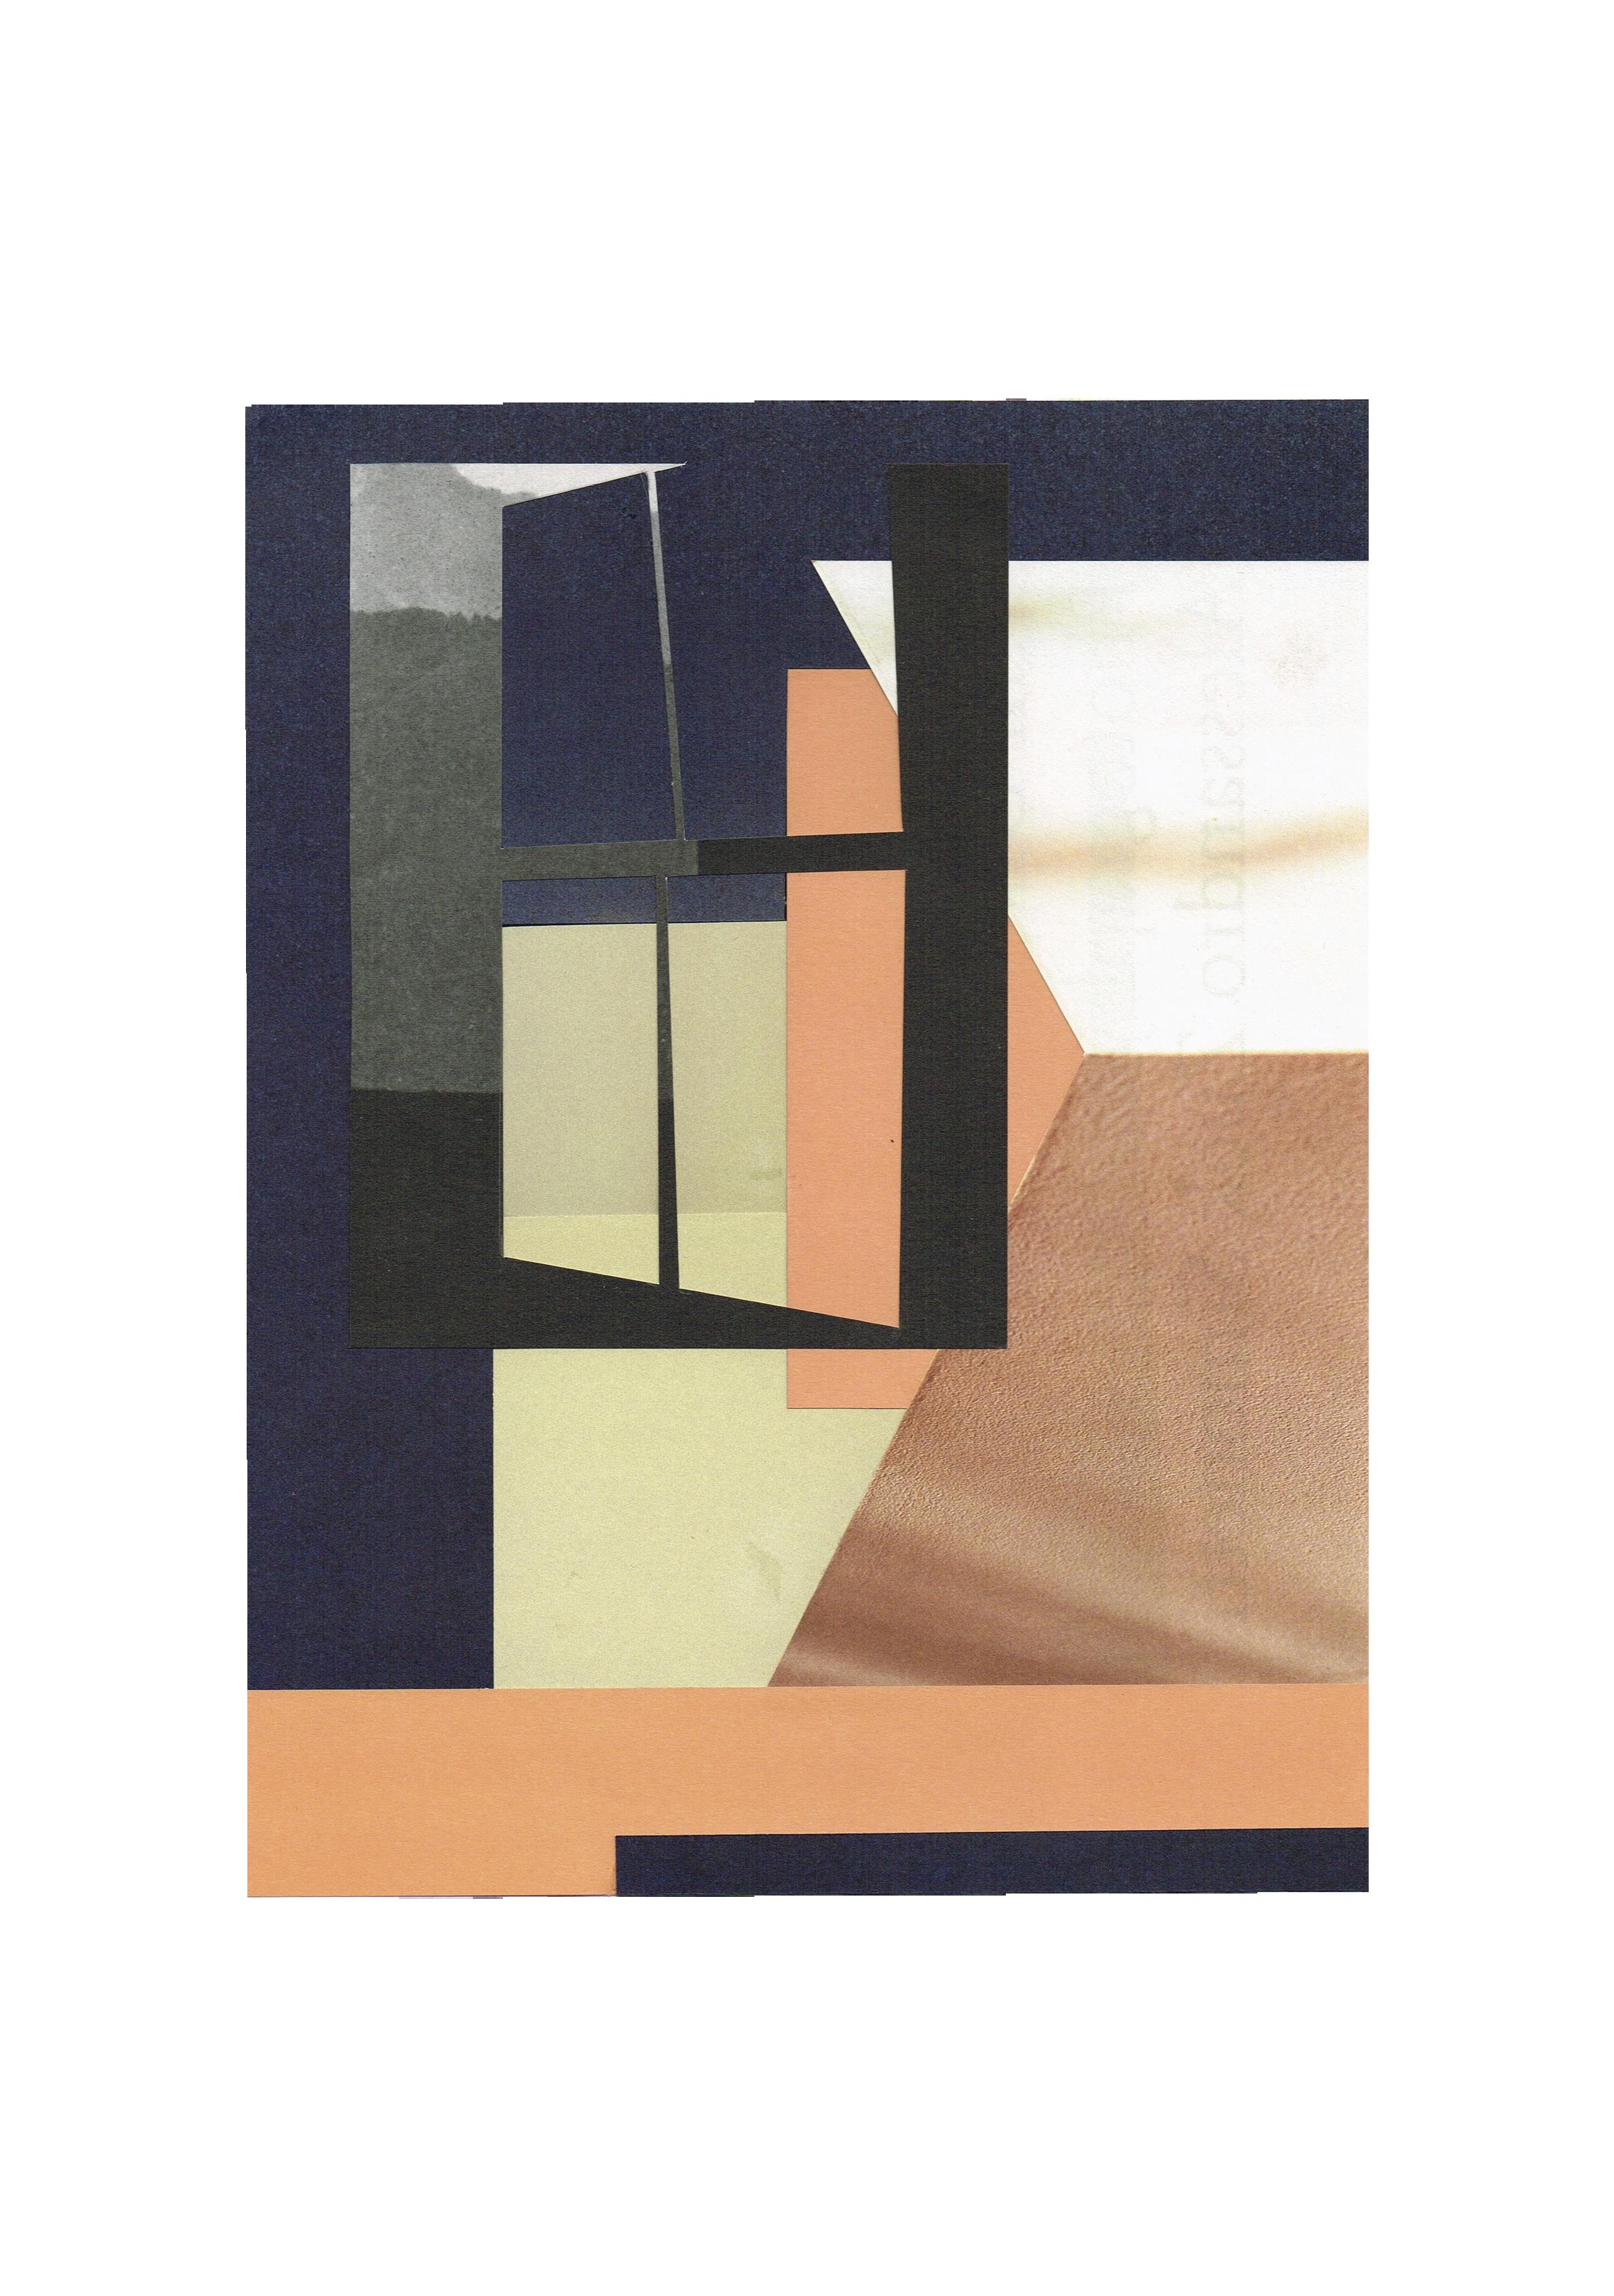 URBAN VIEW collage series